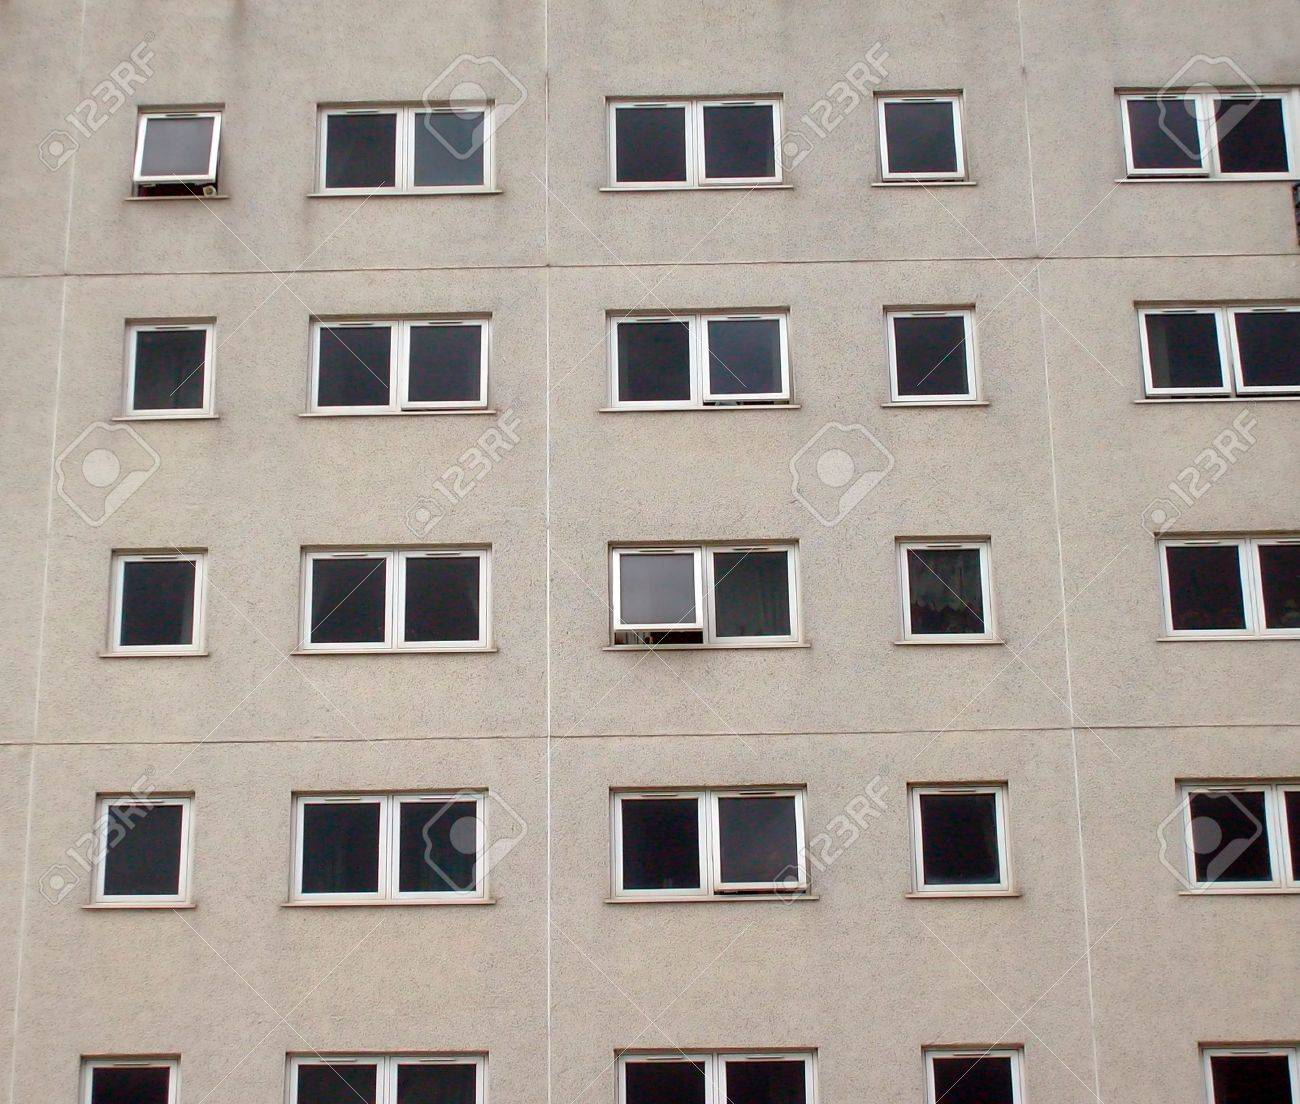 Urban inner city tower block, Bridlington, East YorkshireEngland. - 3287550